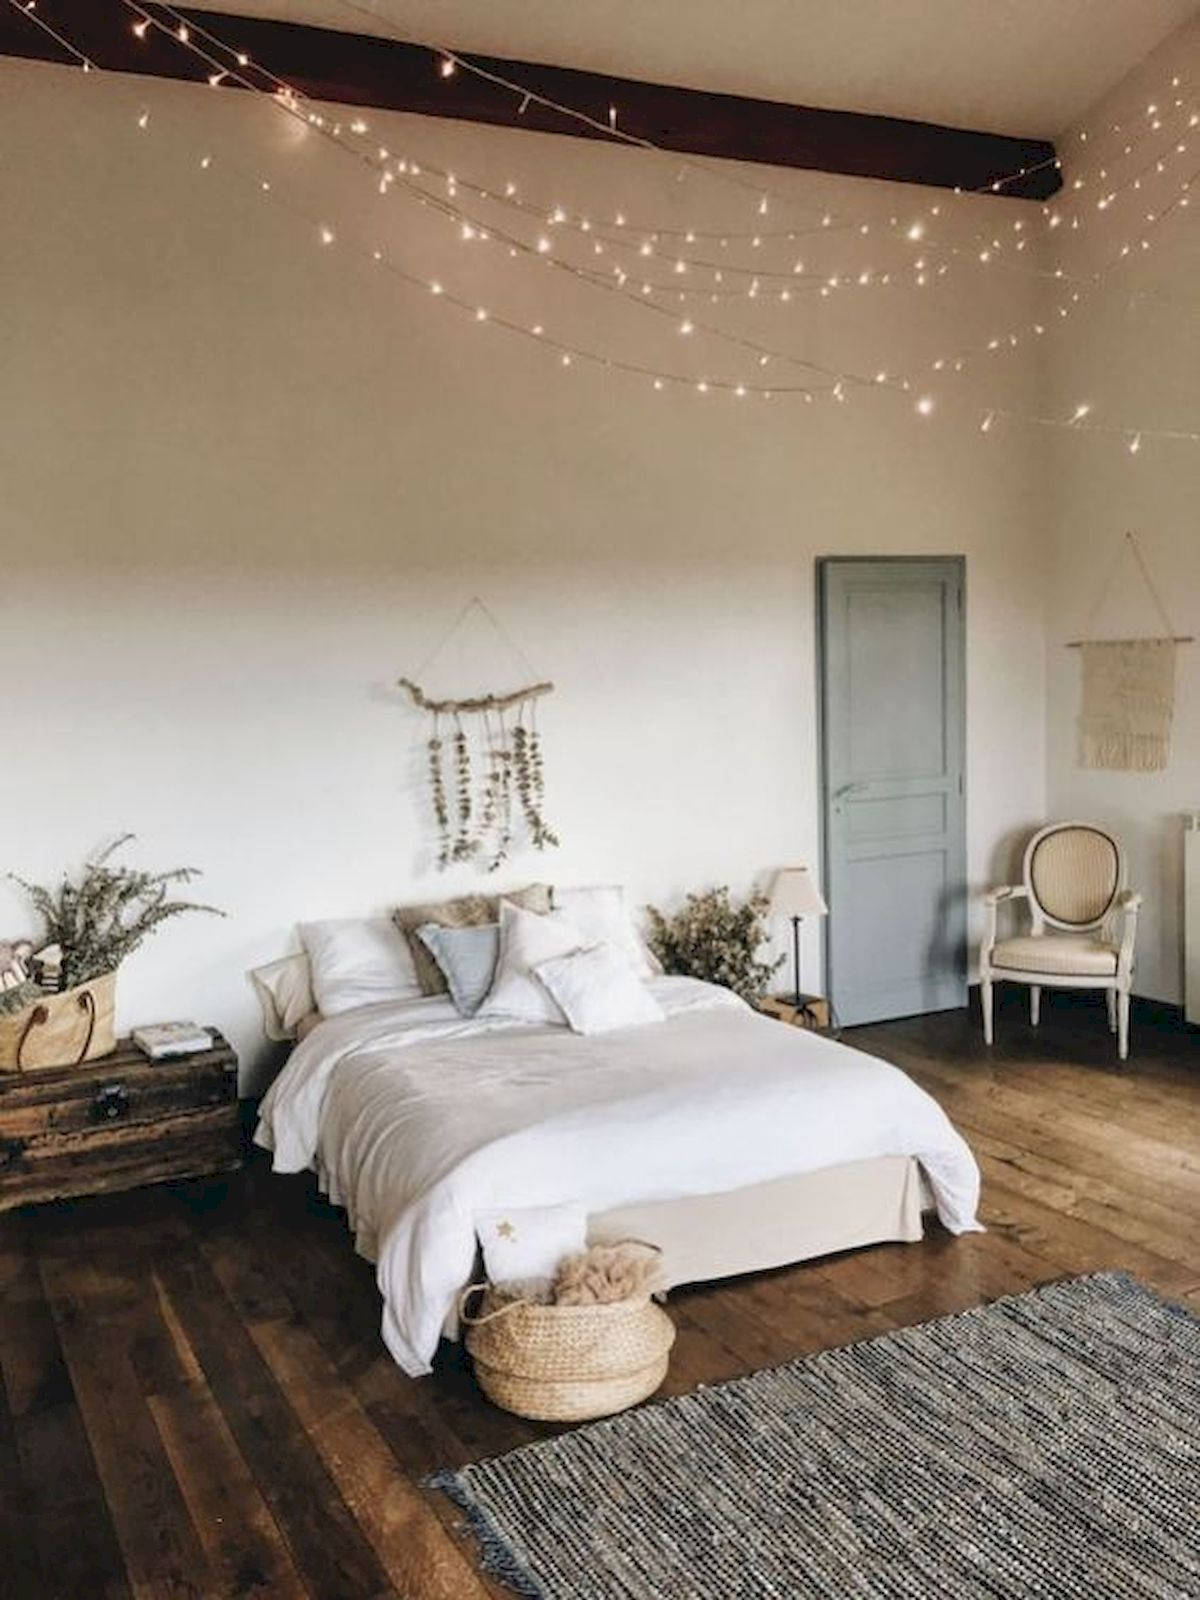 60 Beautiful Bedroom Decor and Design Ideas (36)